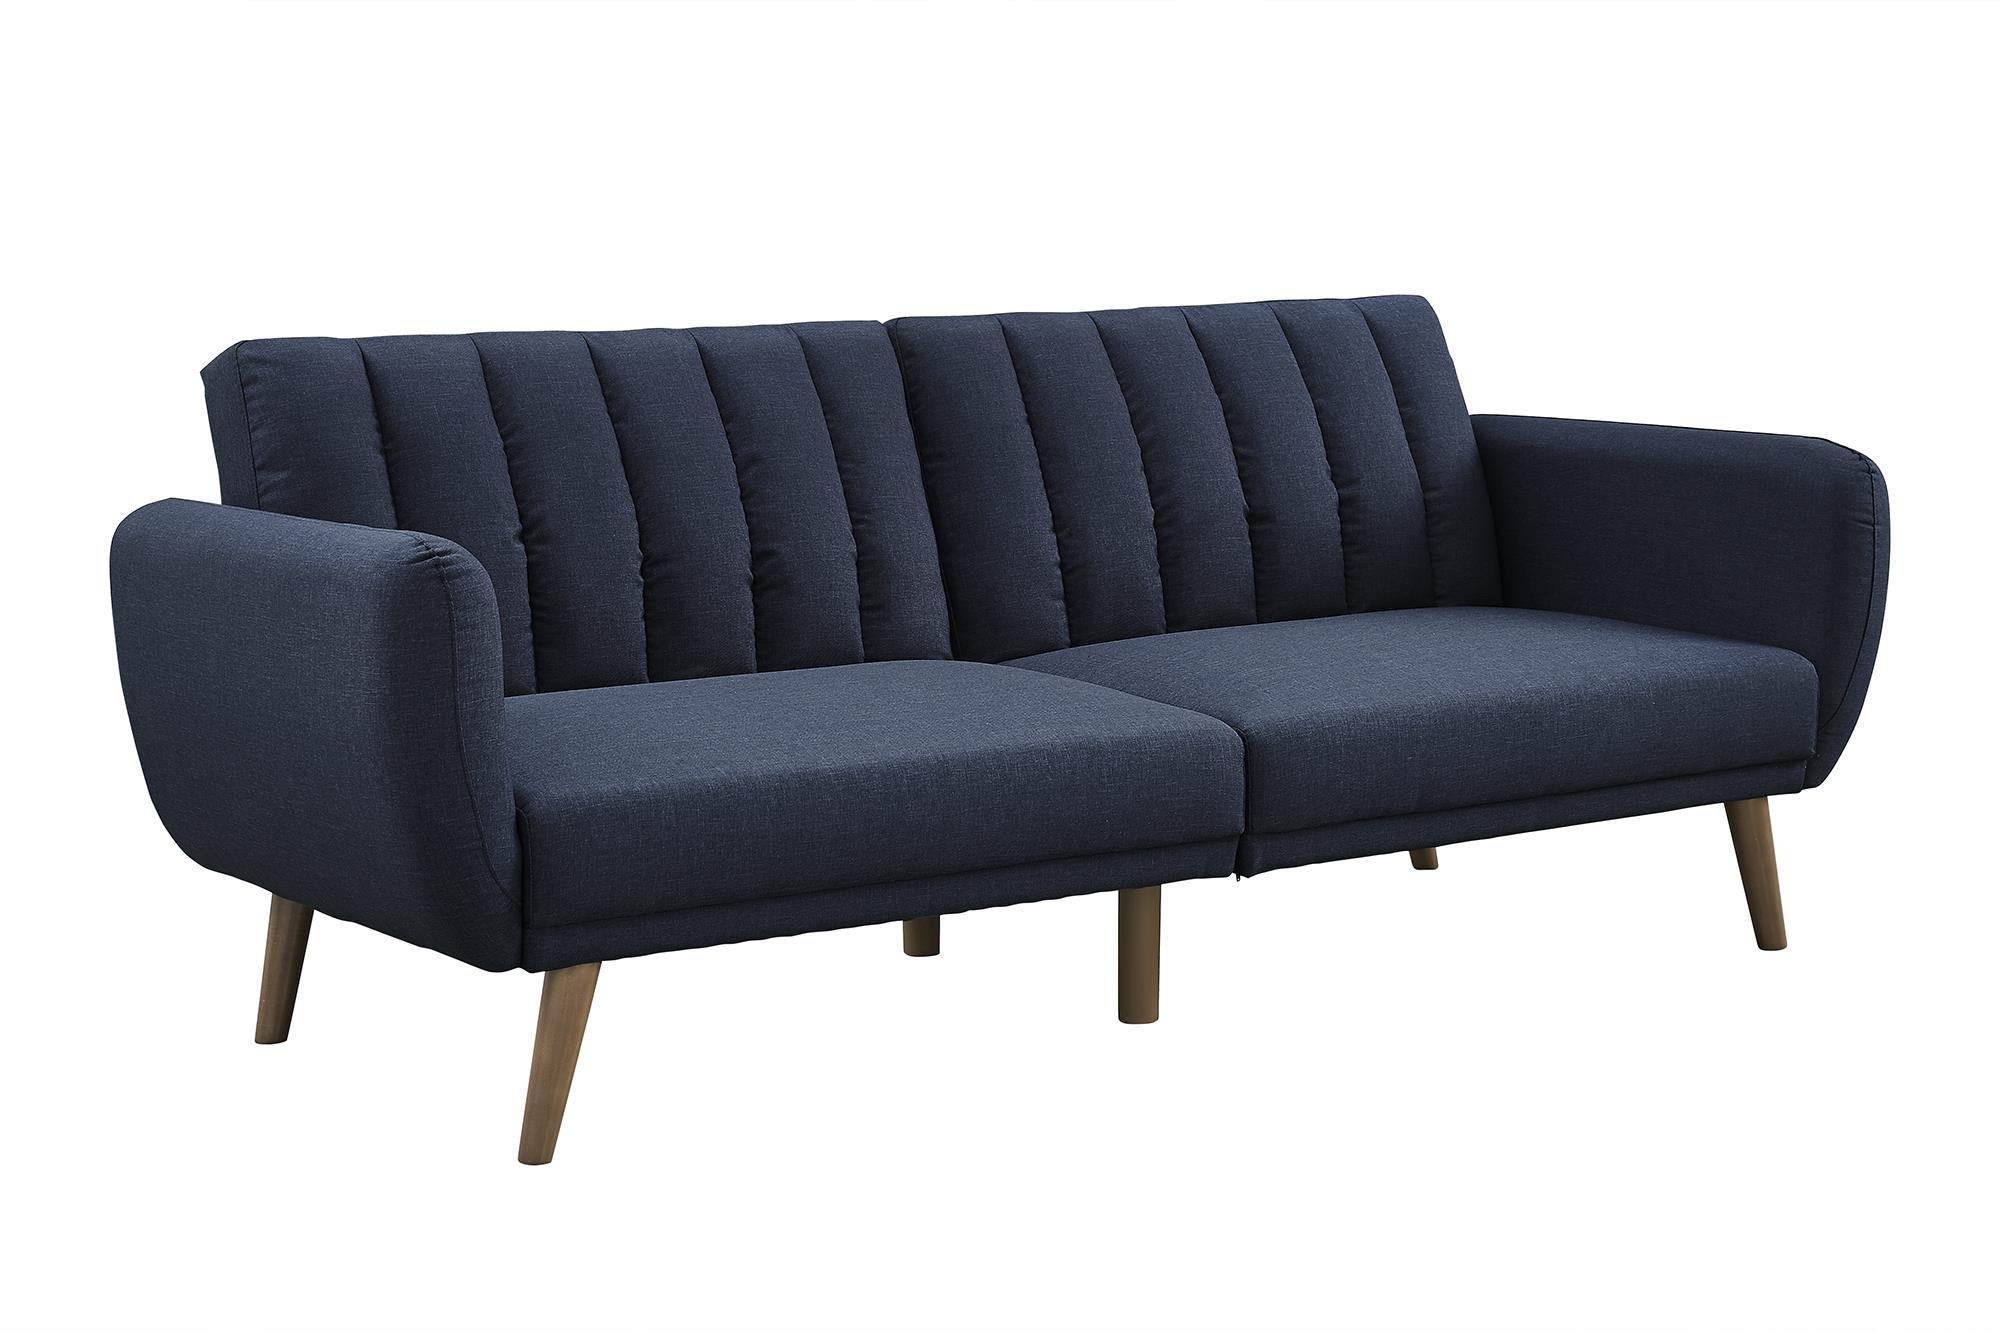 DHP Novogratz Brittany Sofa Futon, Premium Linen Upholstery and Wooden Legs, Blue Linen